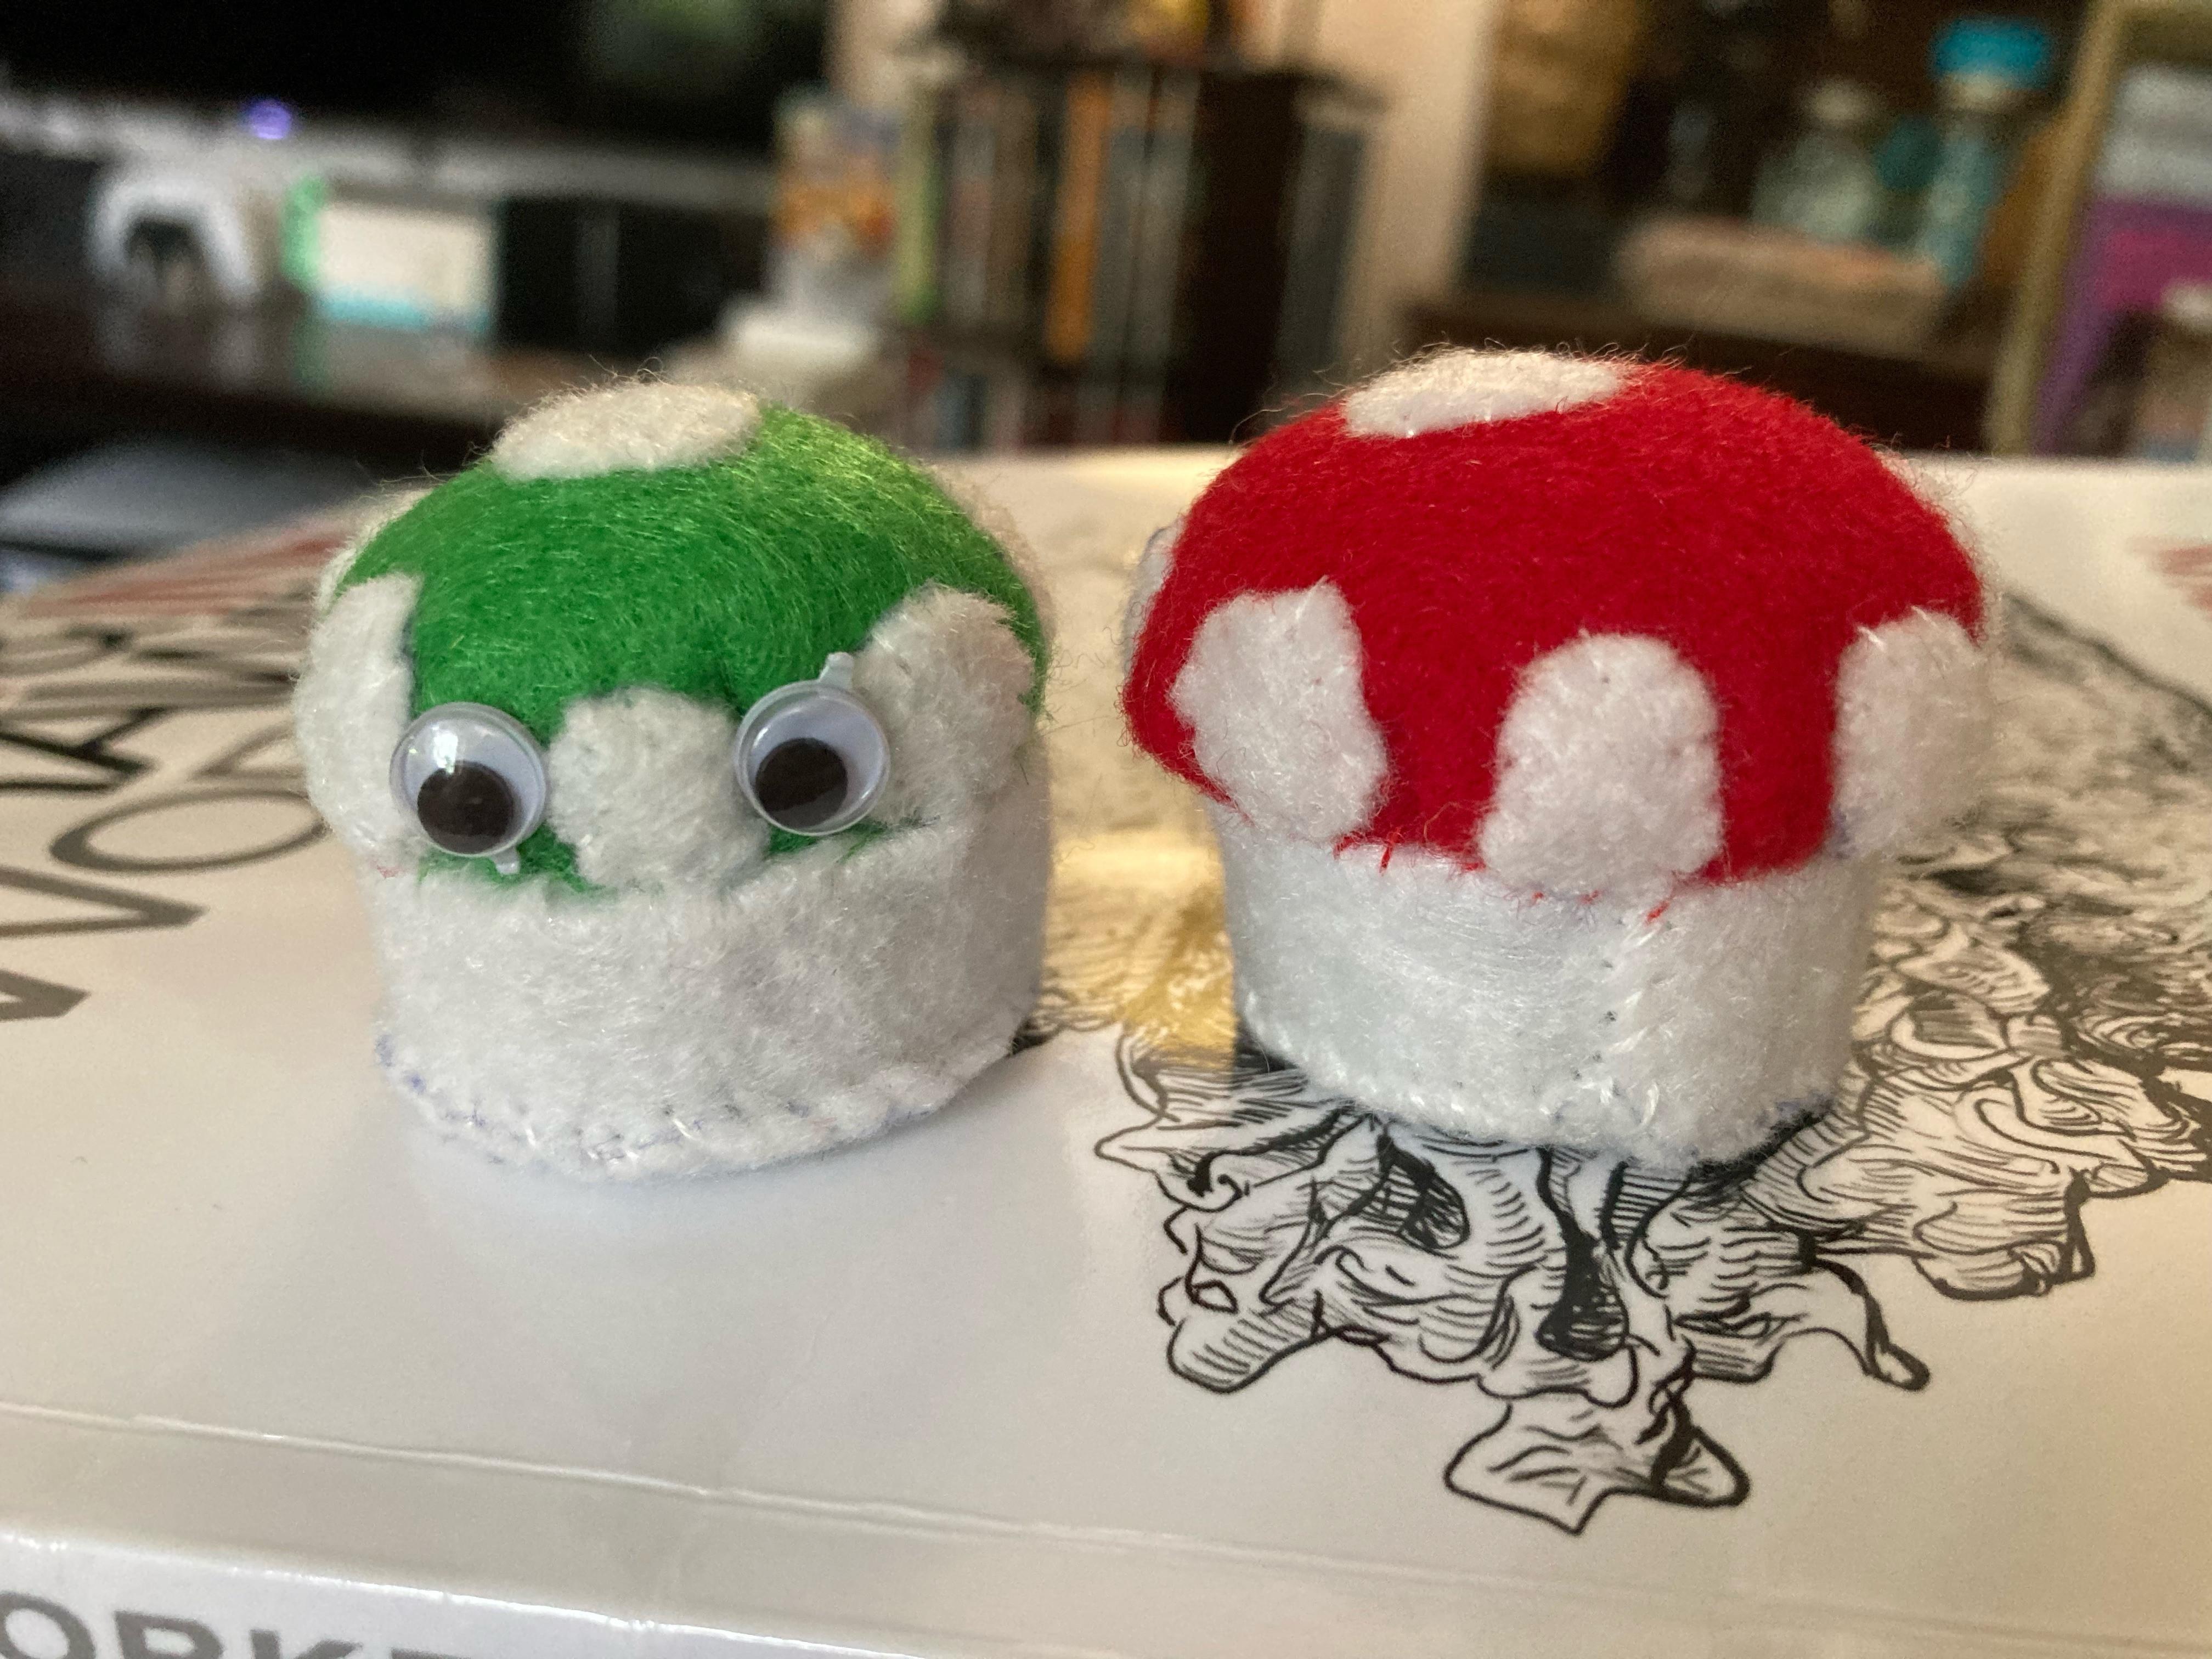 Artistic Sewing: Mushroom Pincushions